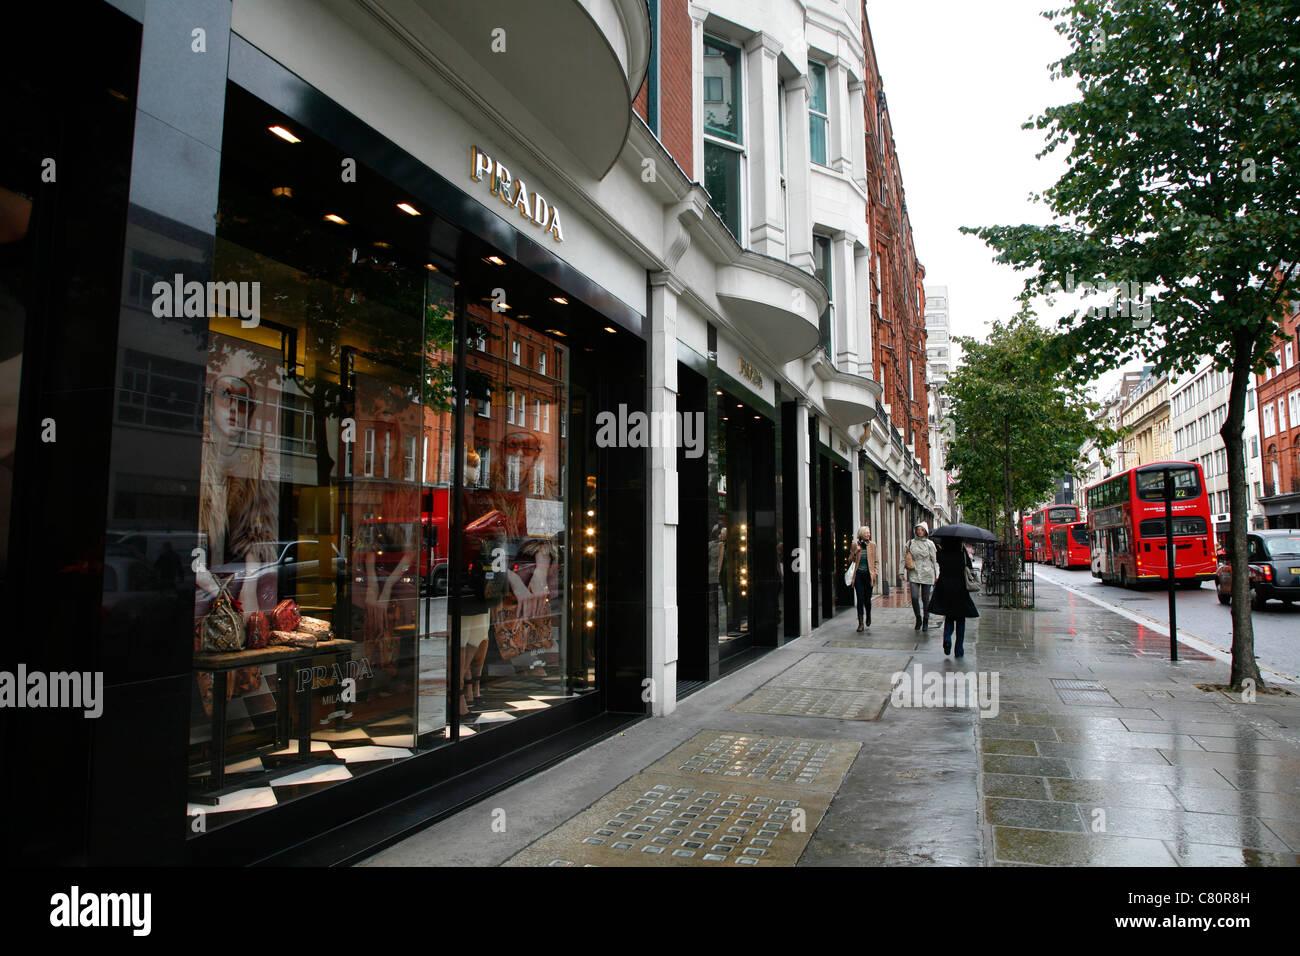 Prada shop on Sloane Street, Knightsbridge, London, UK Stock Photo